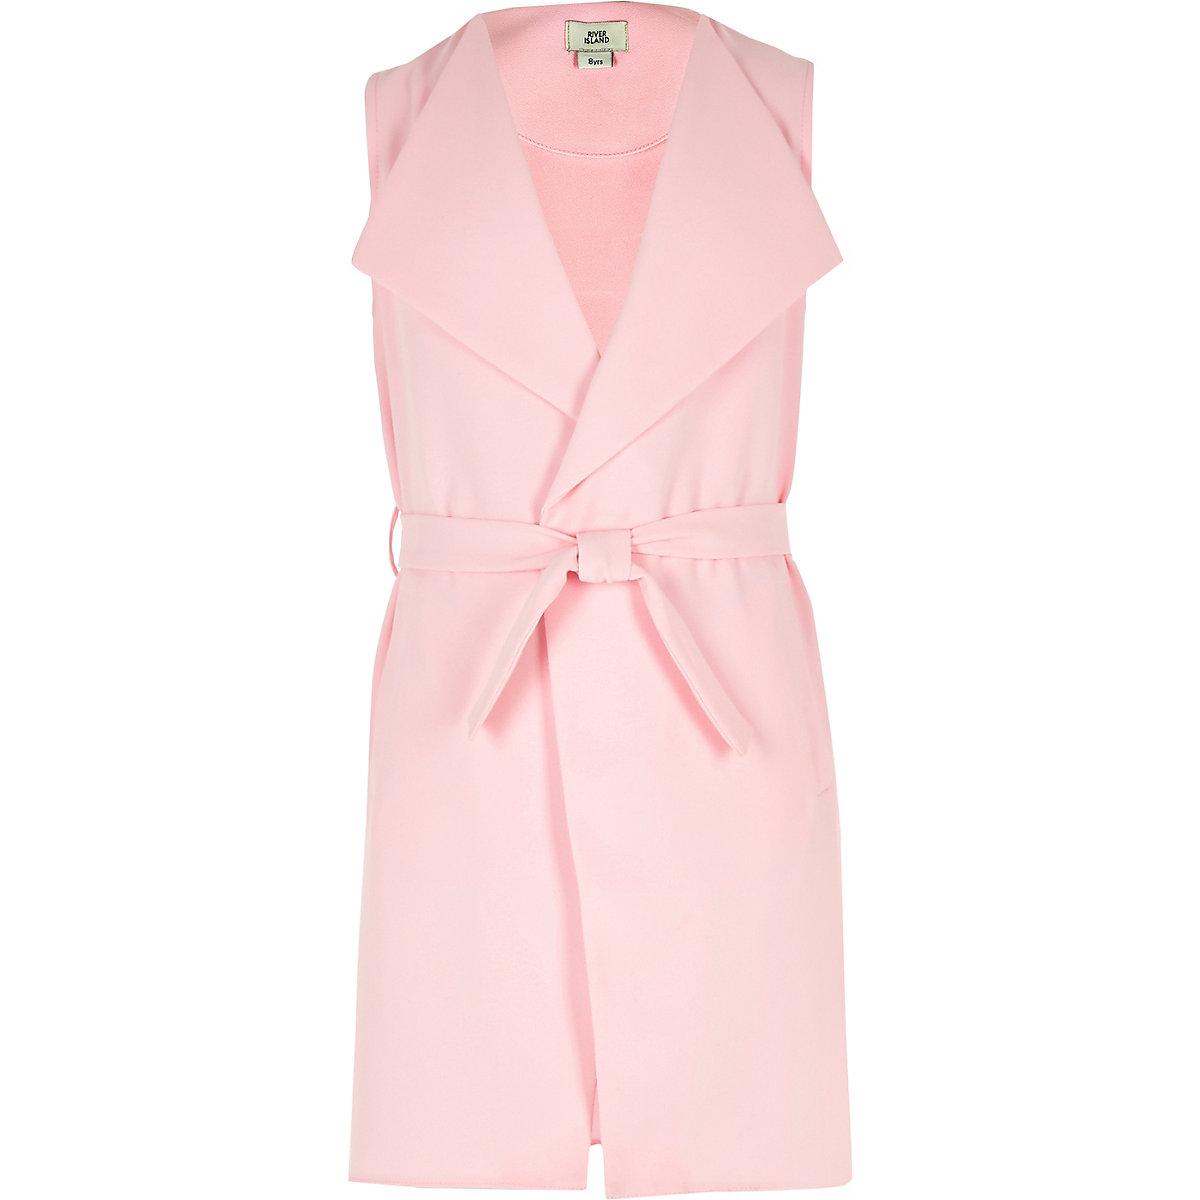 Girls pink sleeveless duster jacket